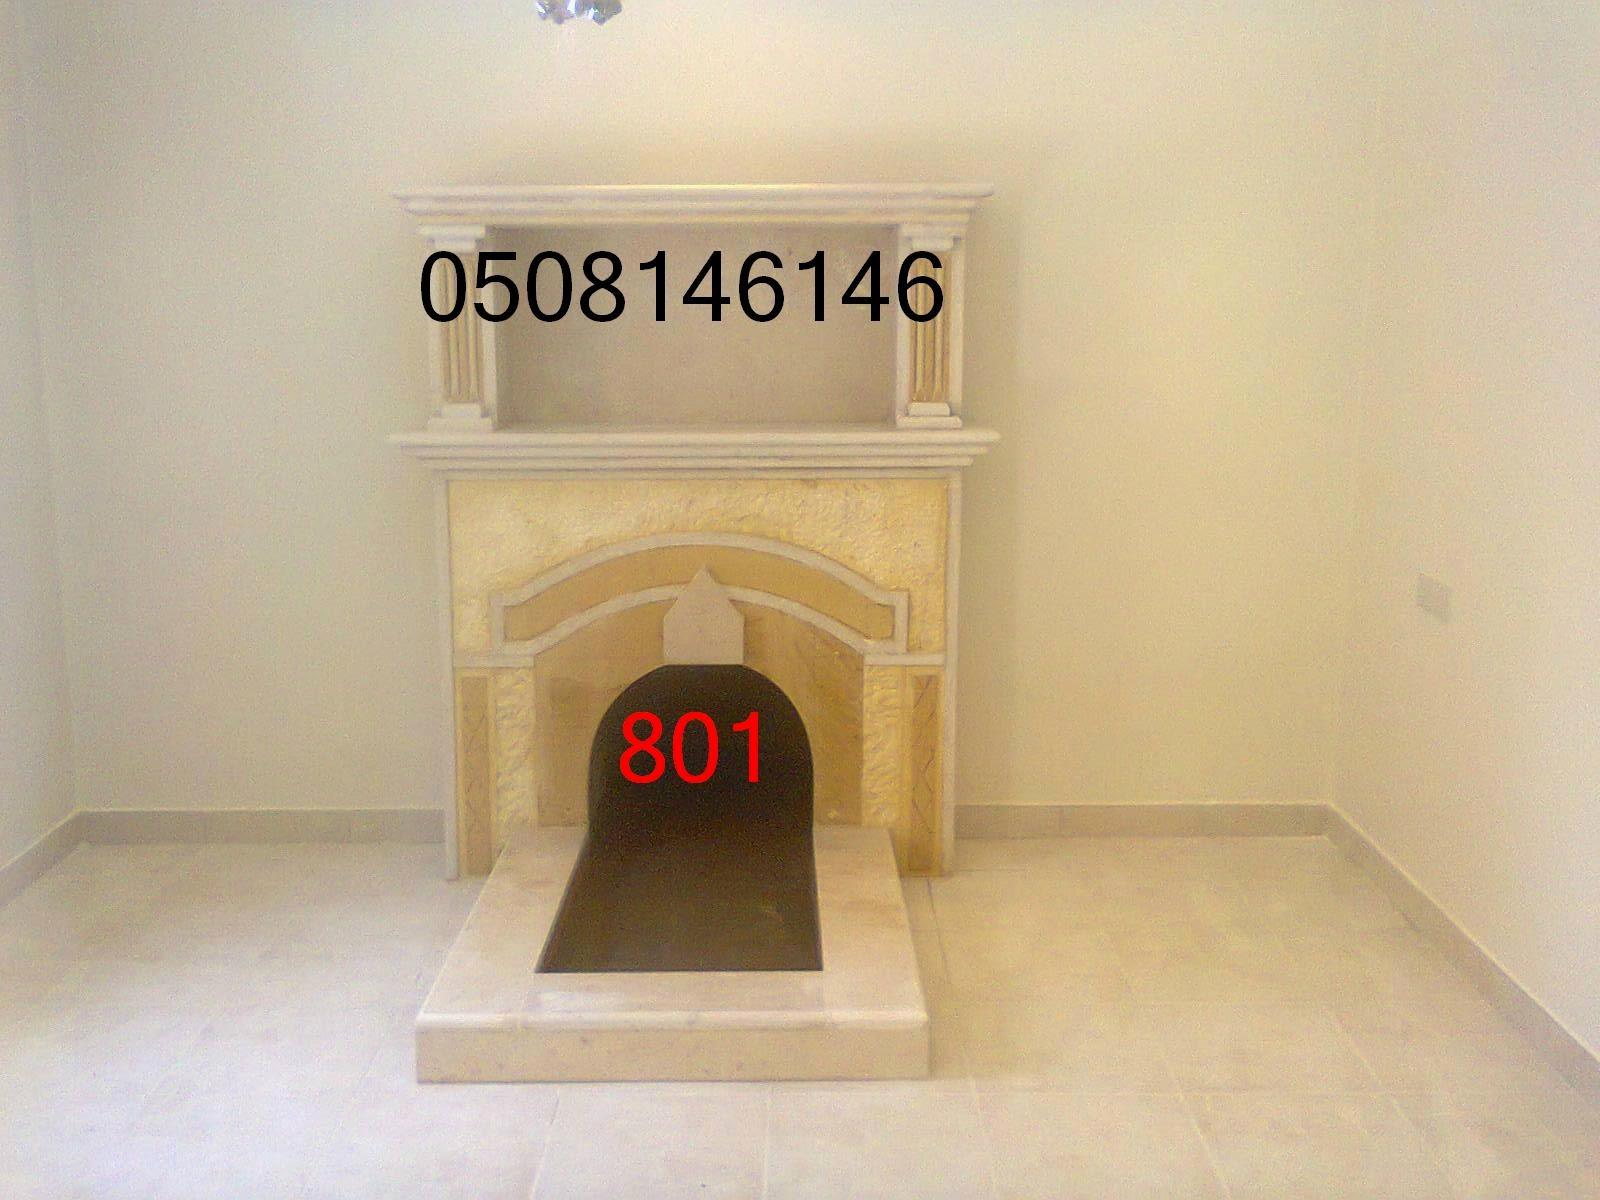 ديكورات مشبات 801.jpg